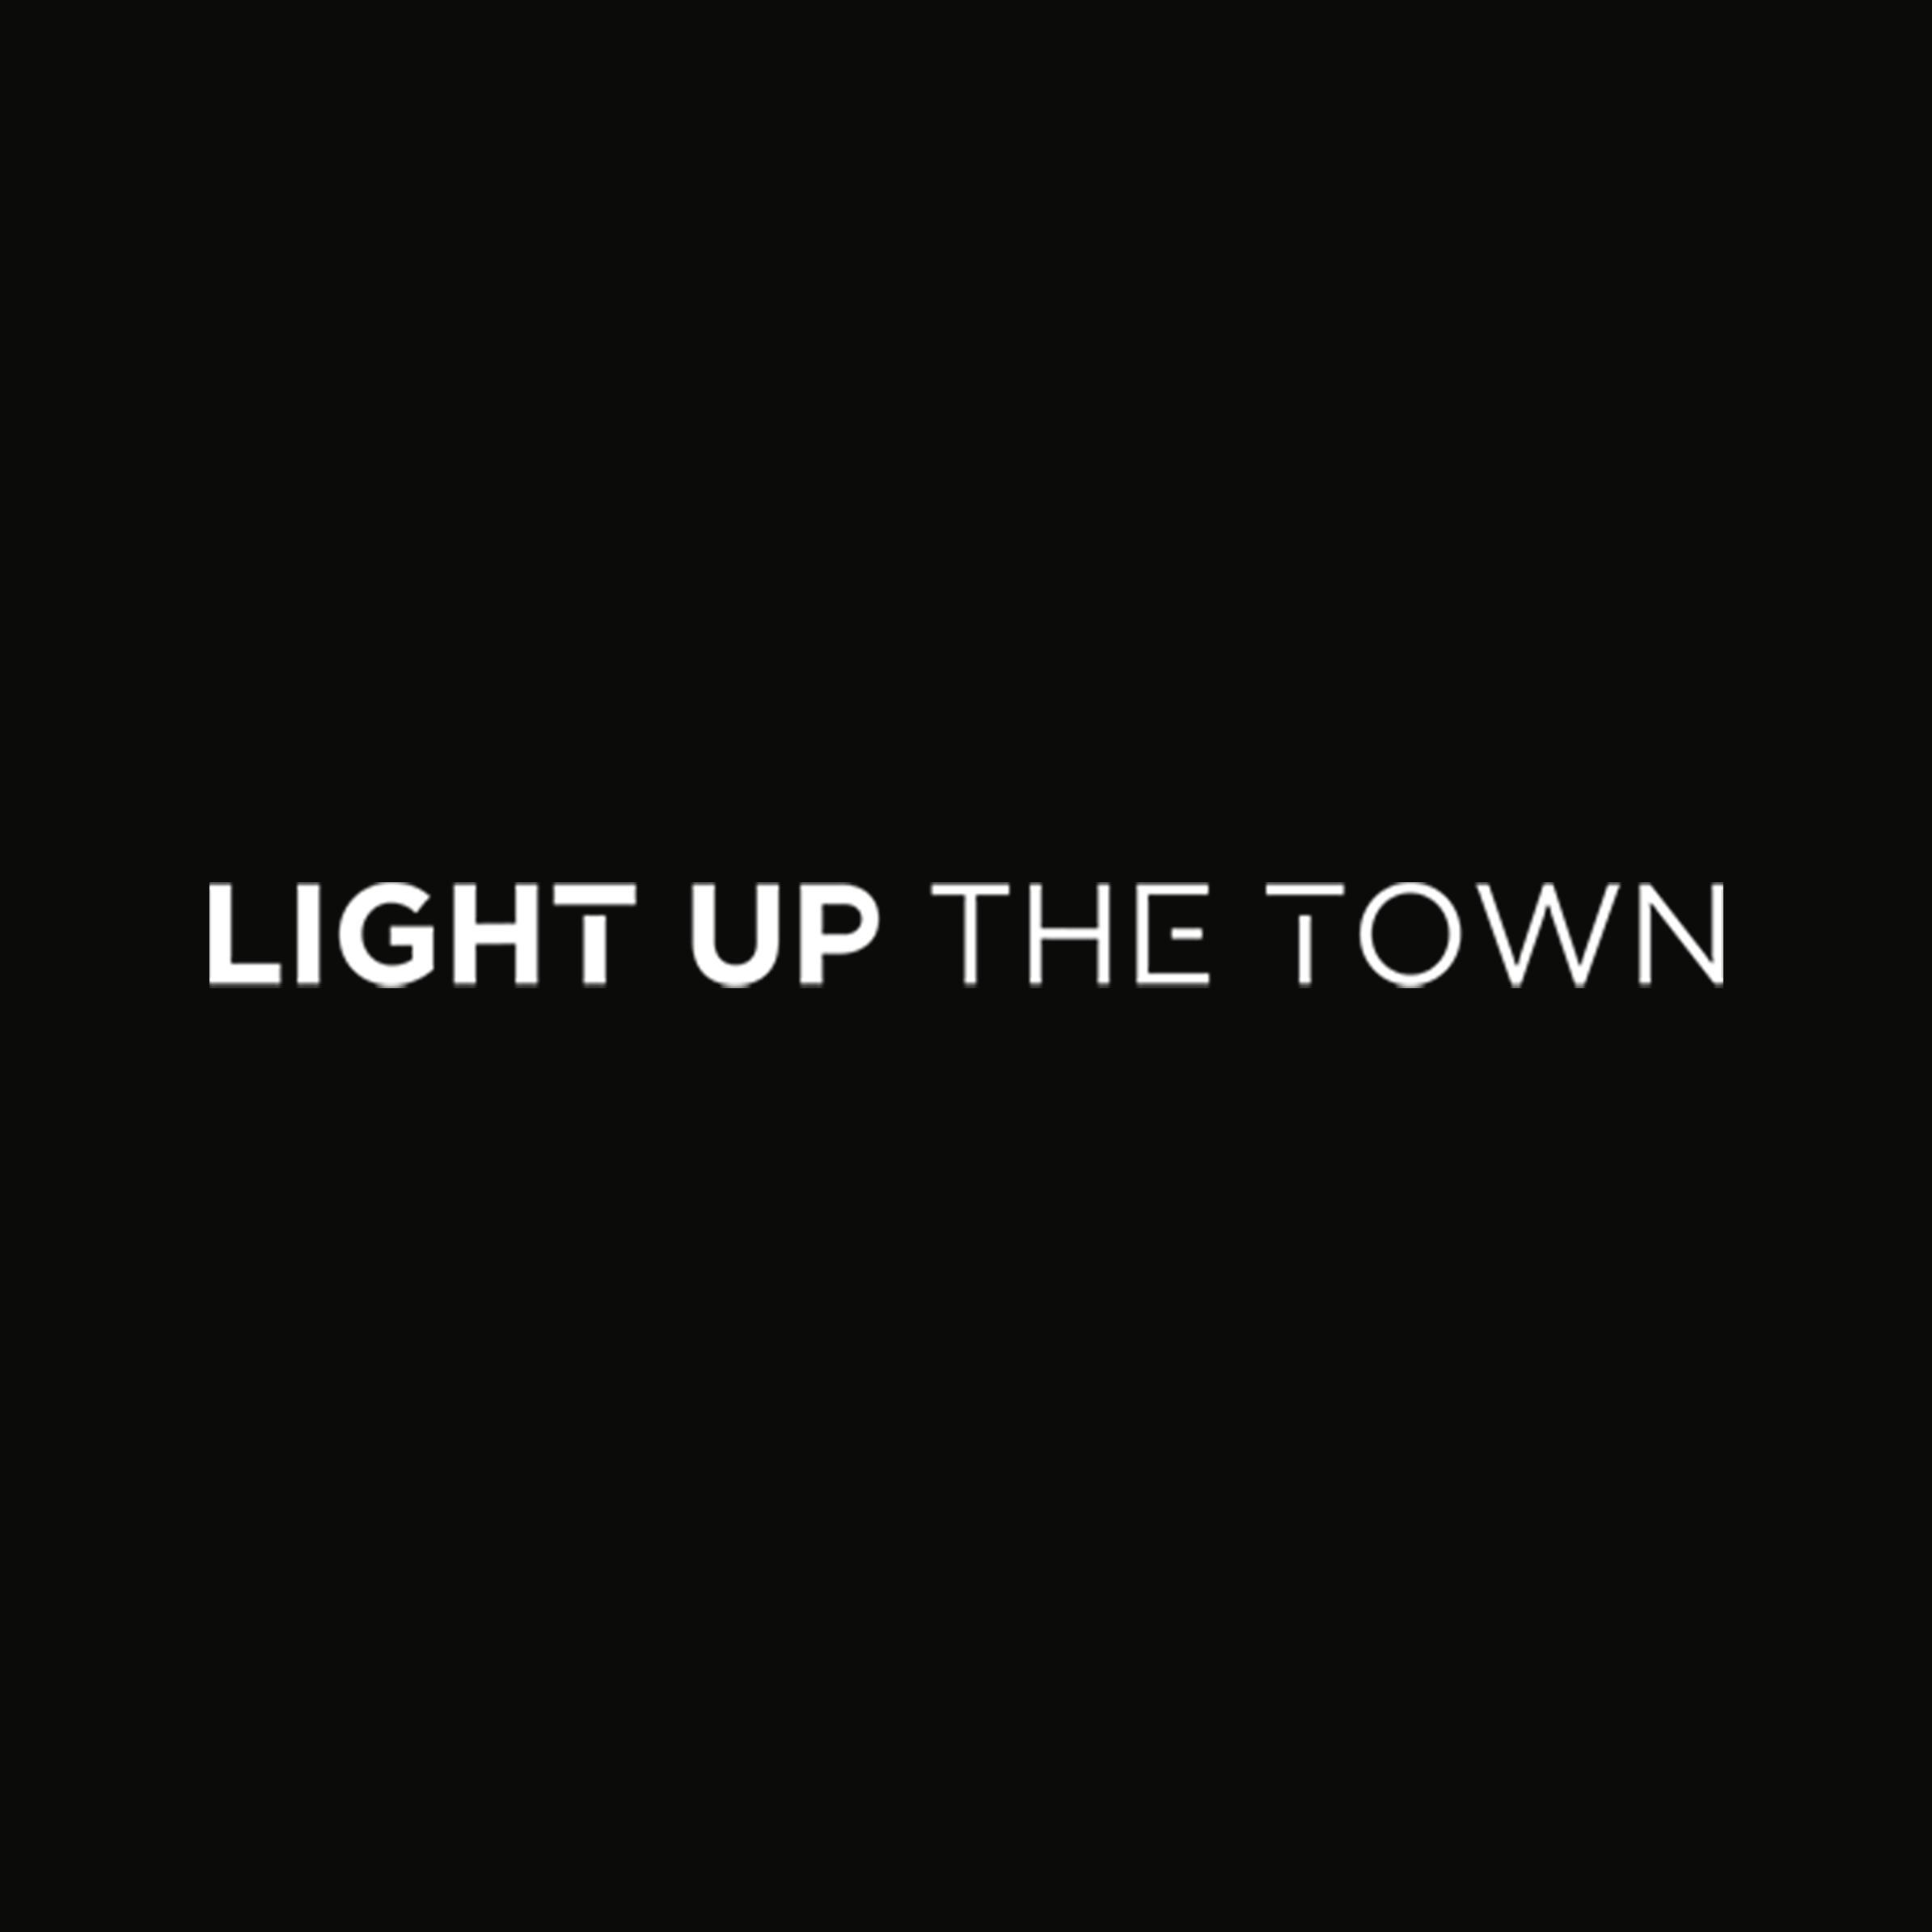 Thomas Kern Grafiker Rise Up Media Light Up The Town